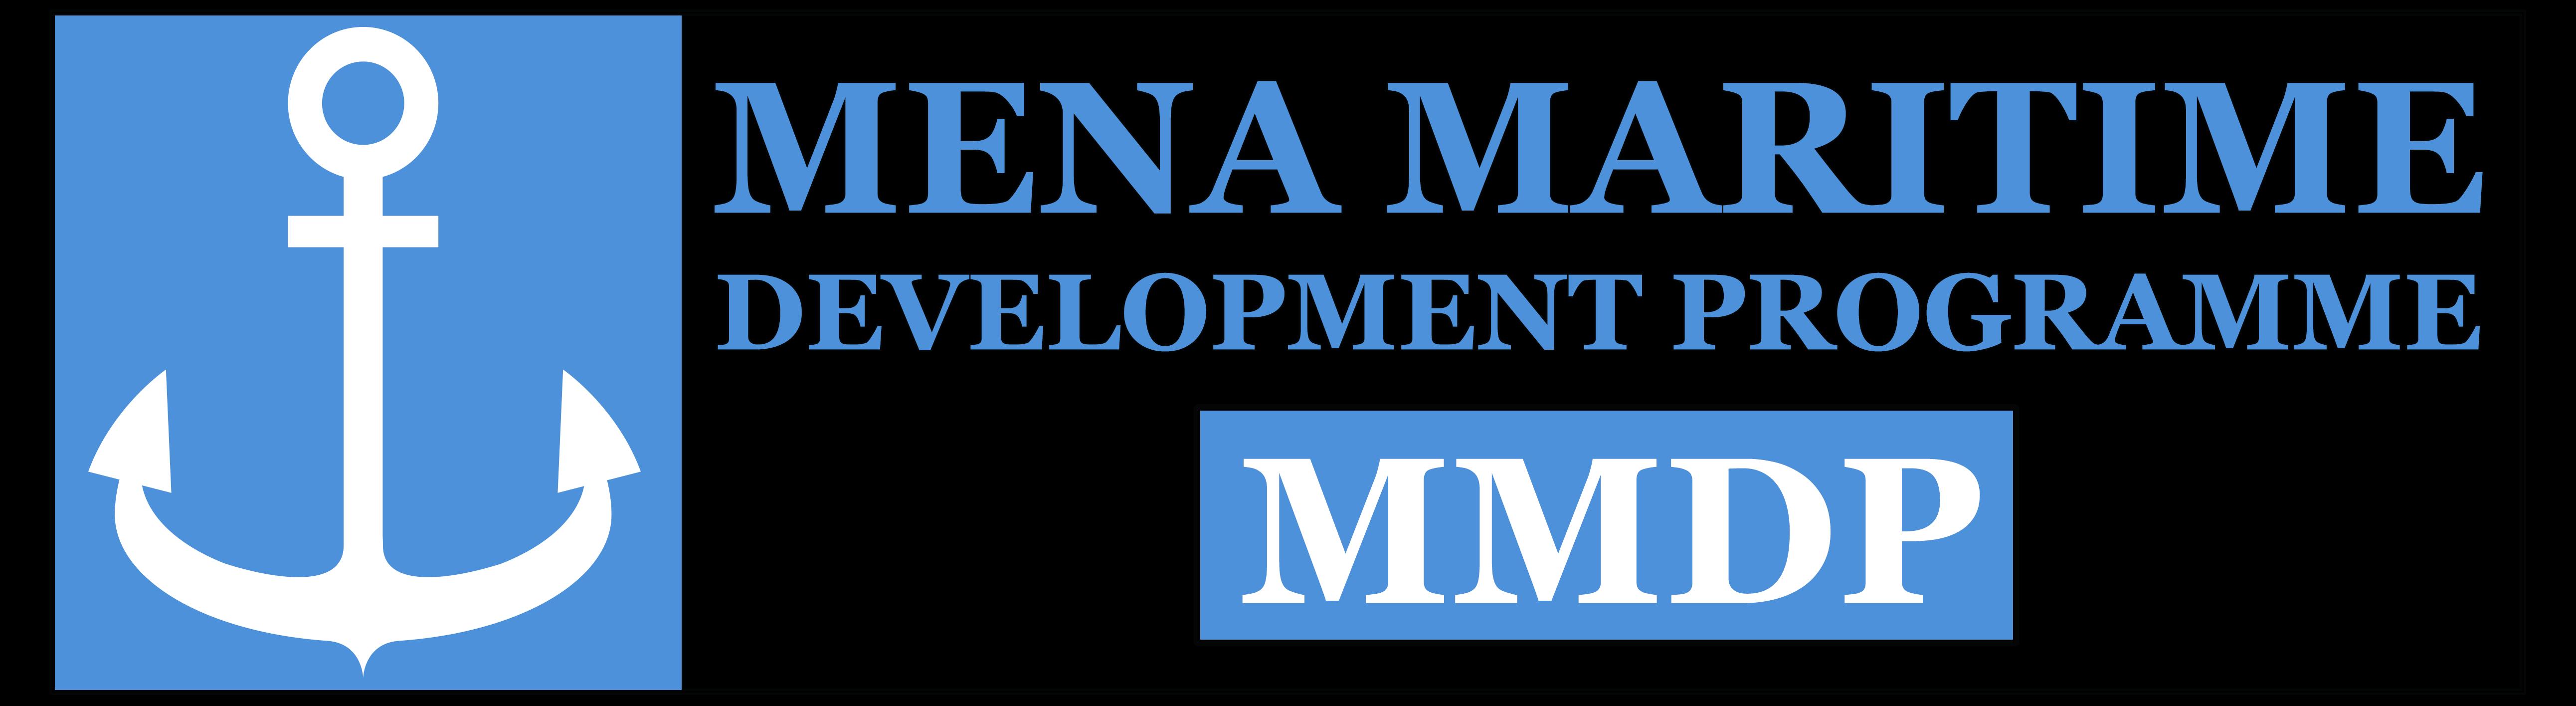 MENA Maritime